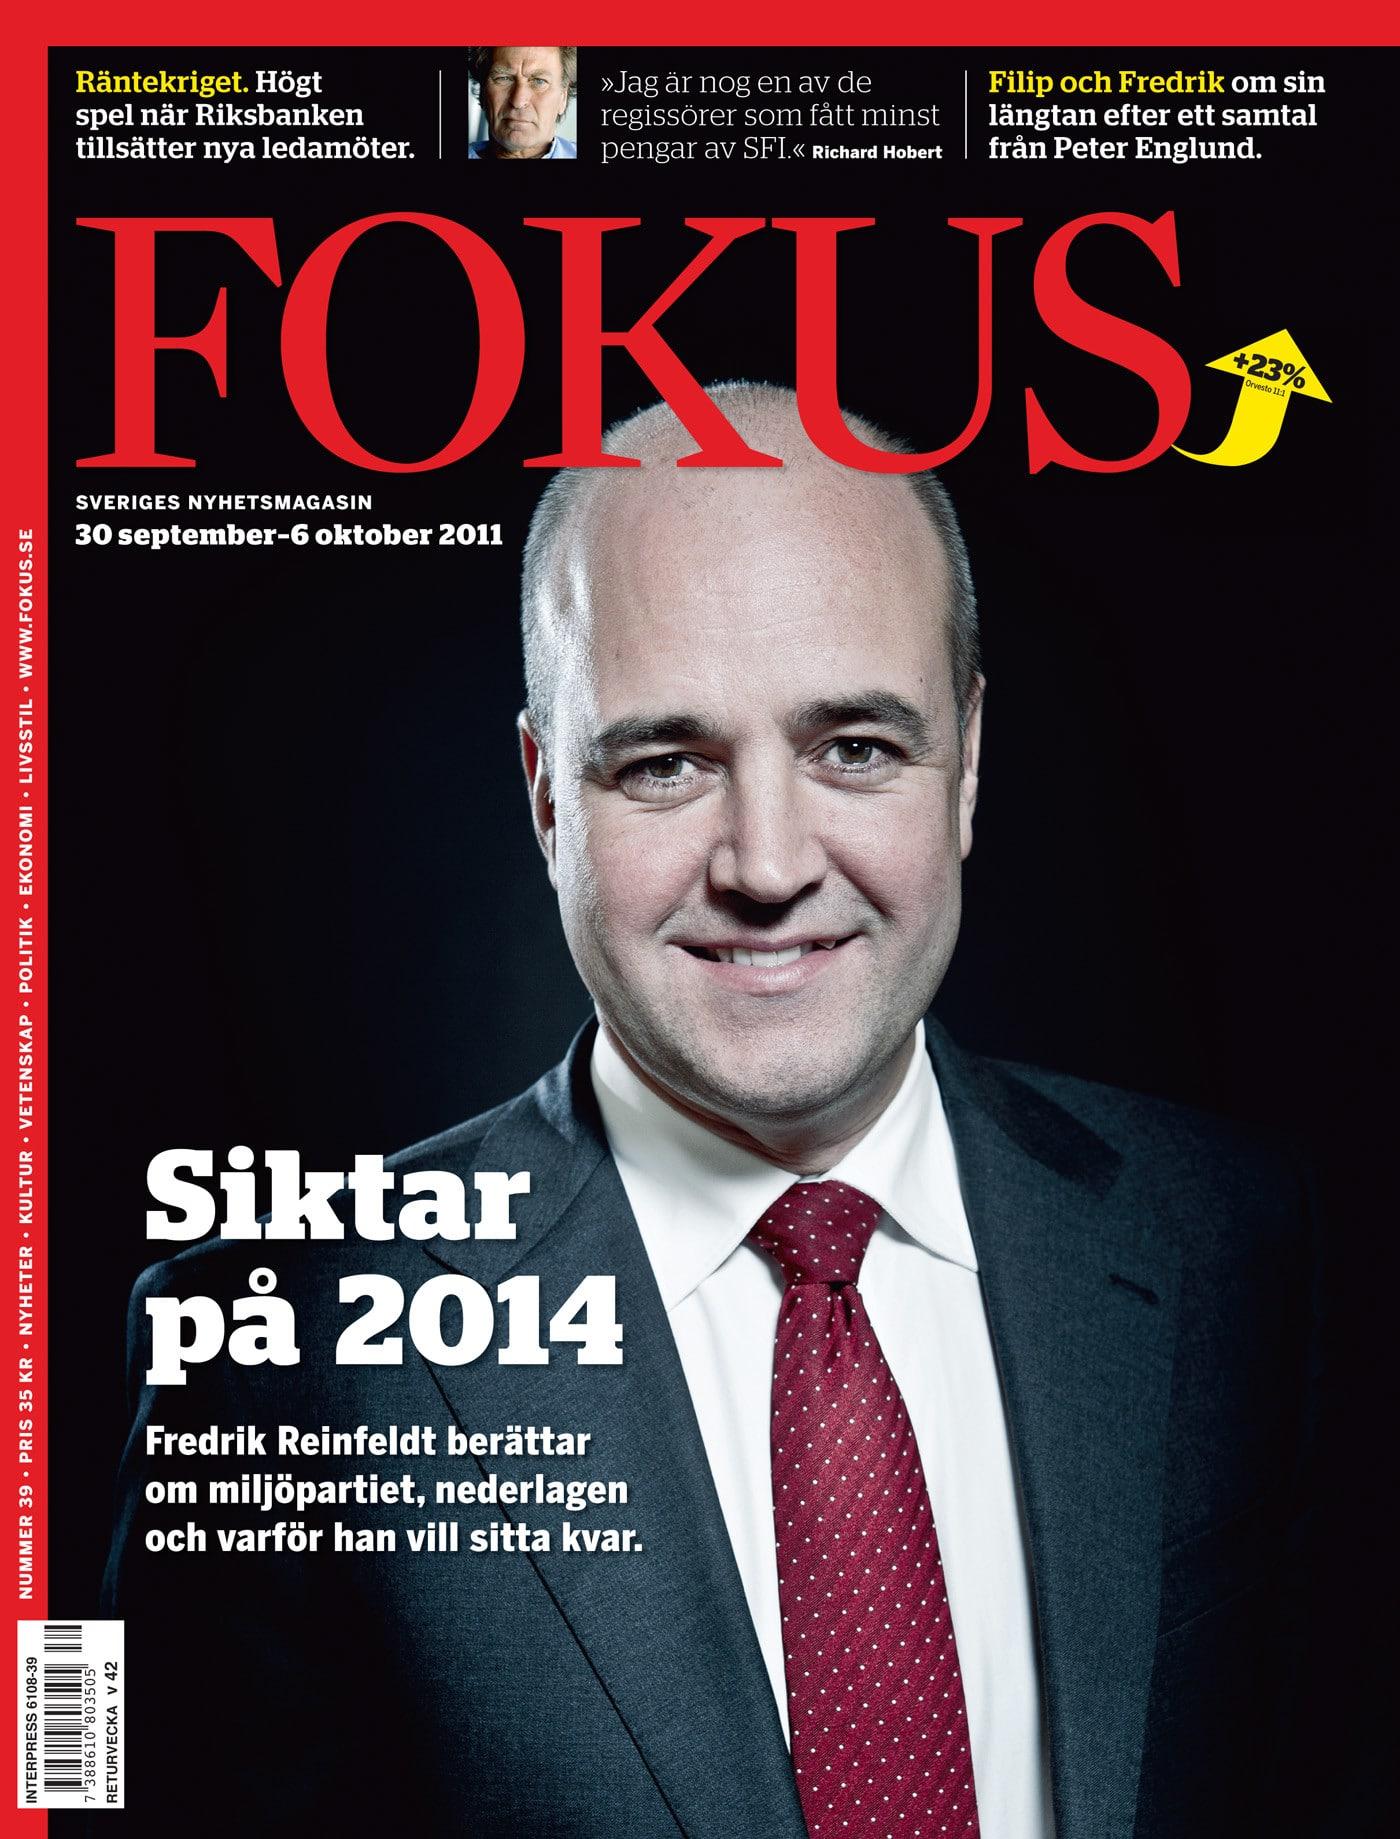 Fredrik Reinfeldt för Fokus